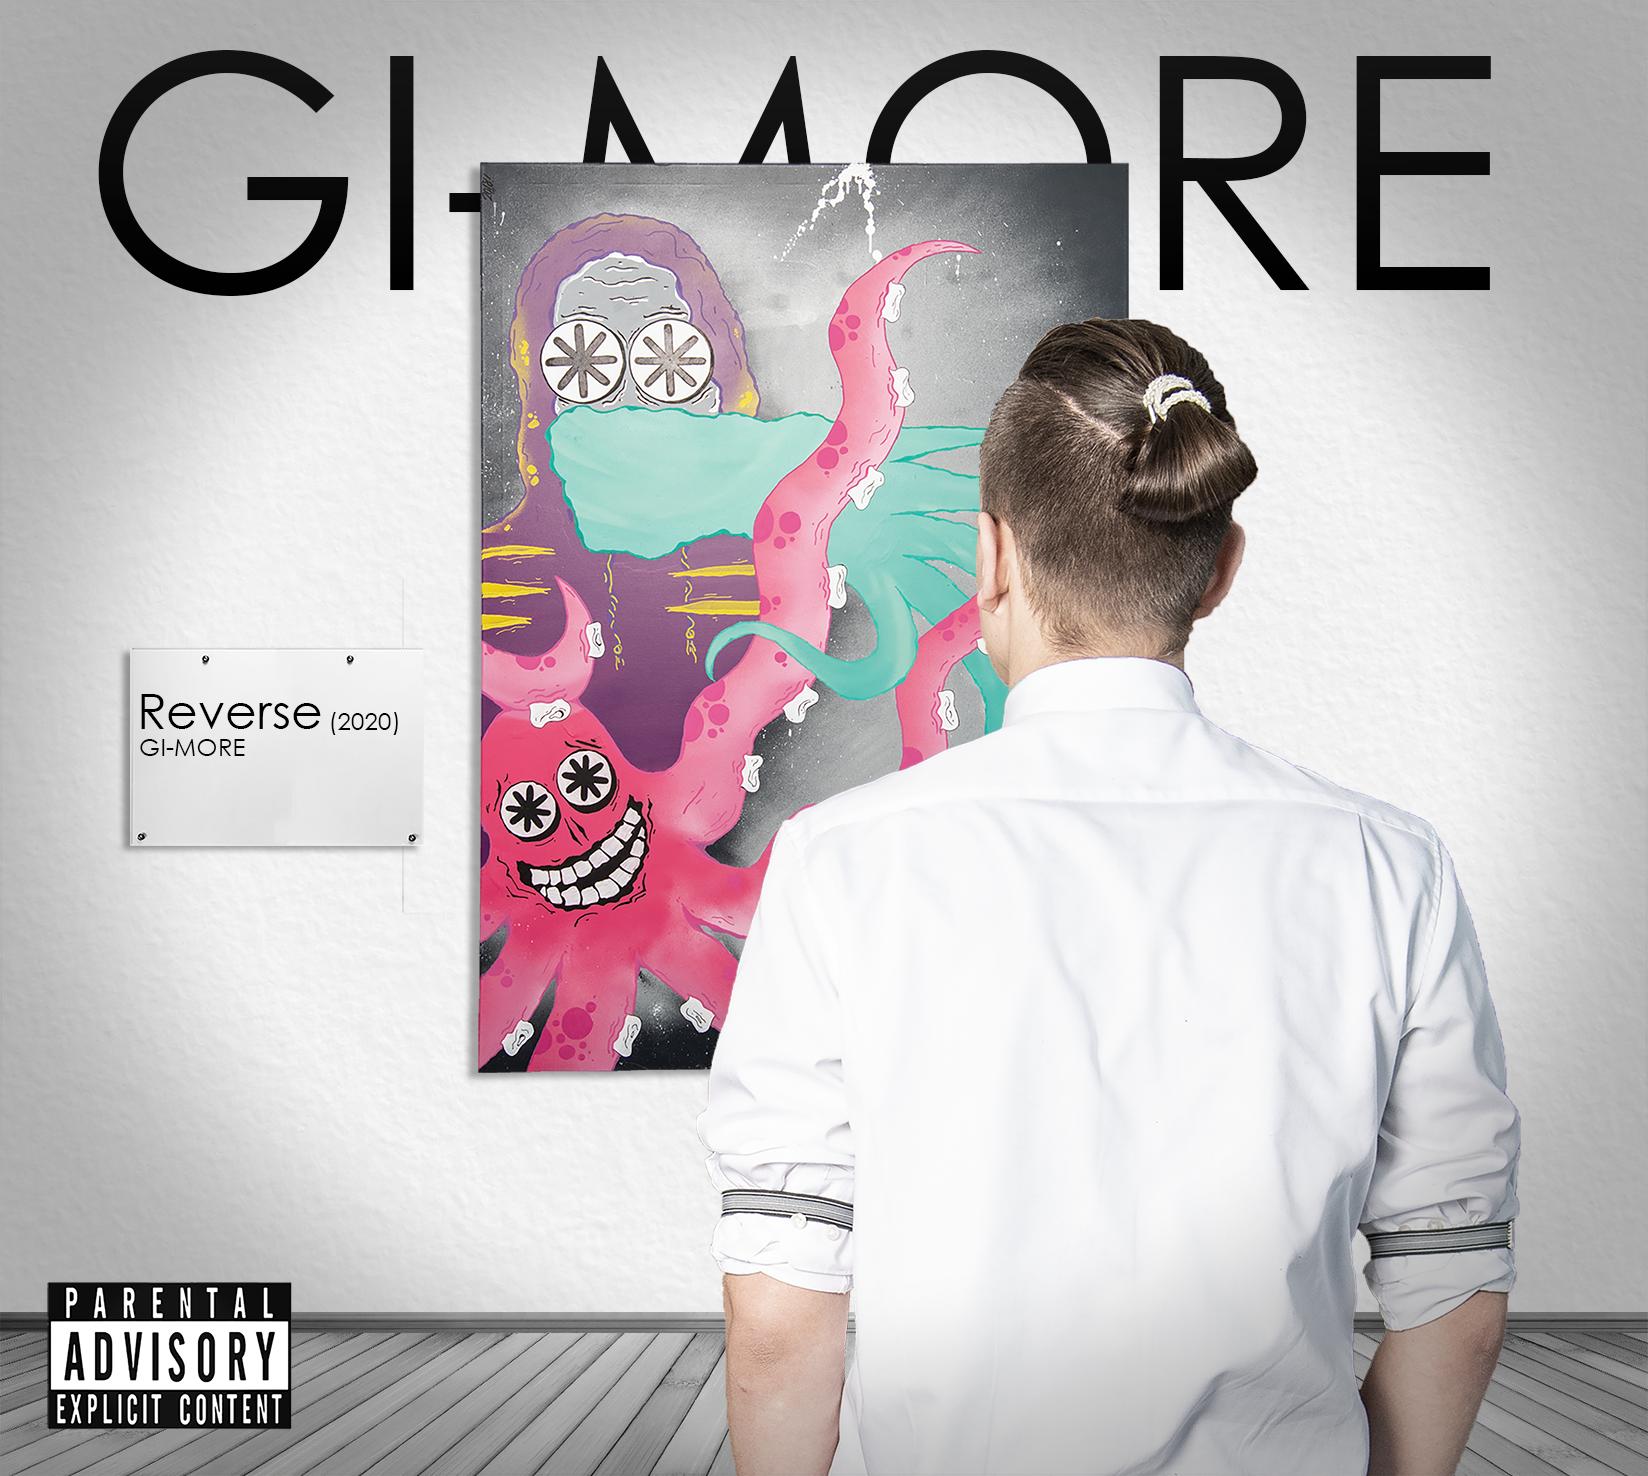 GI-MORE - Reverse